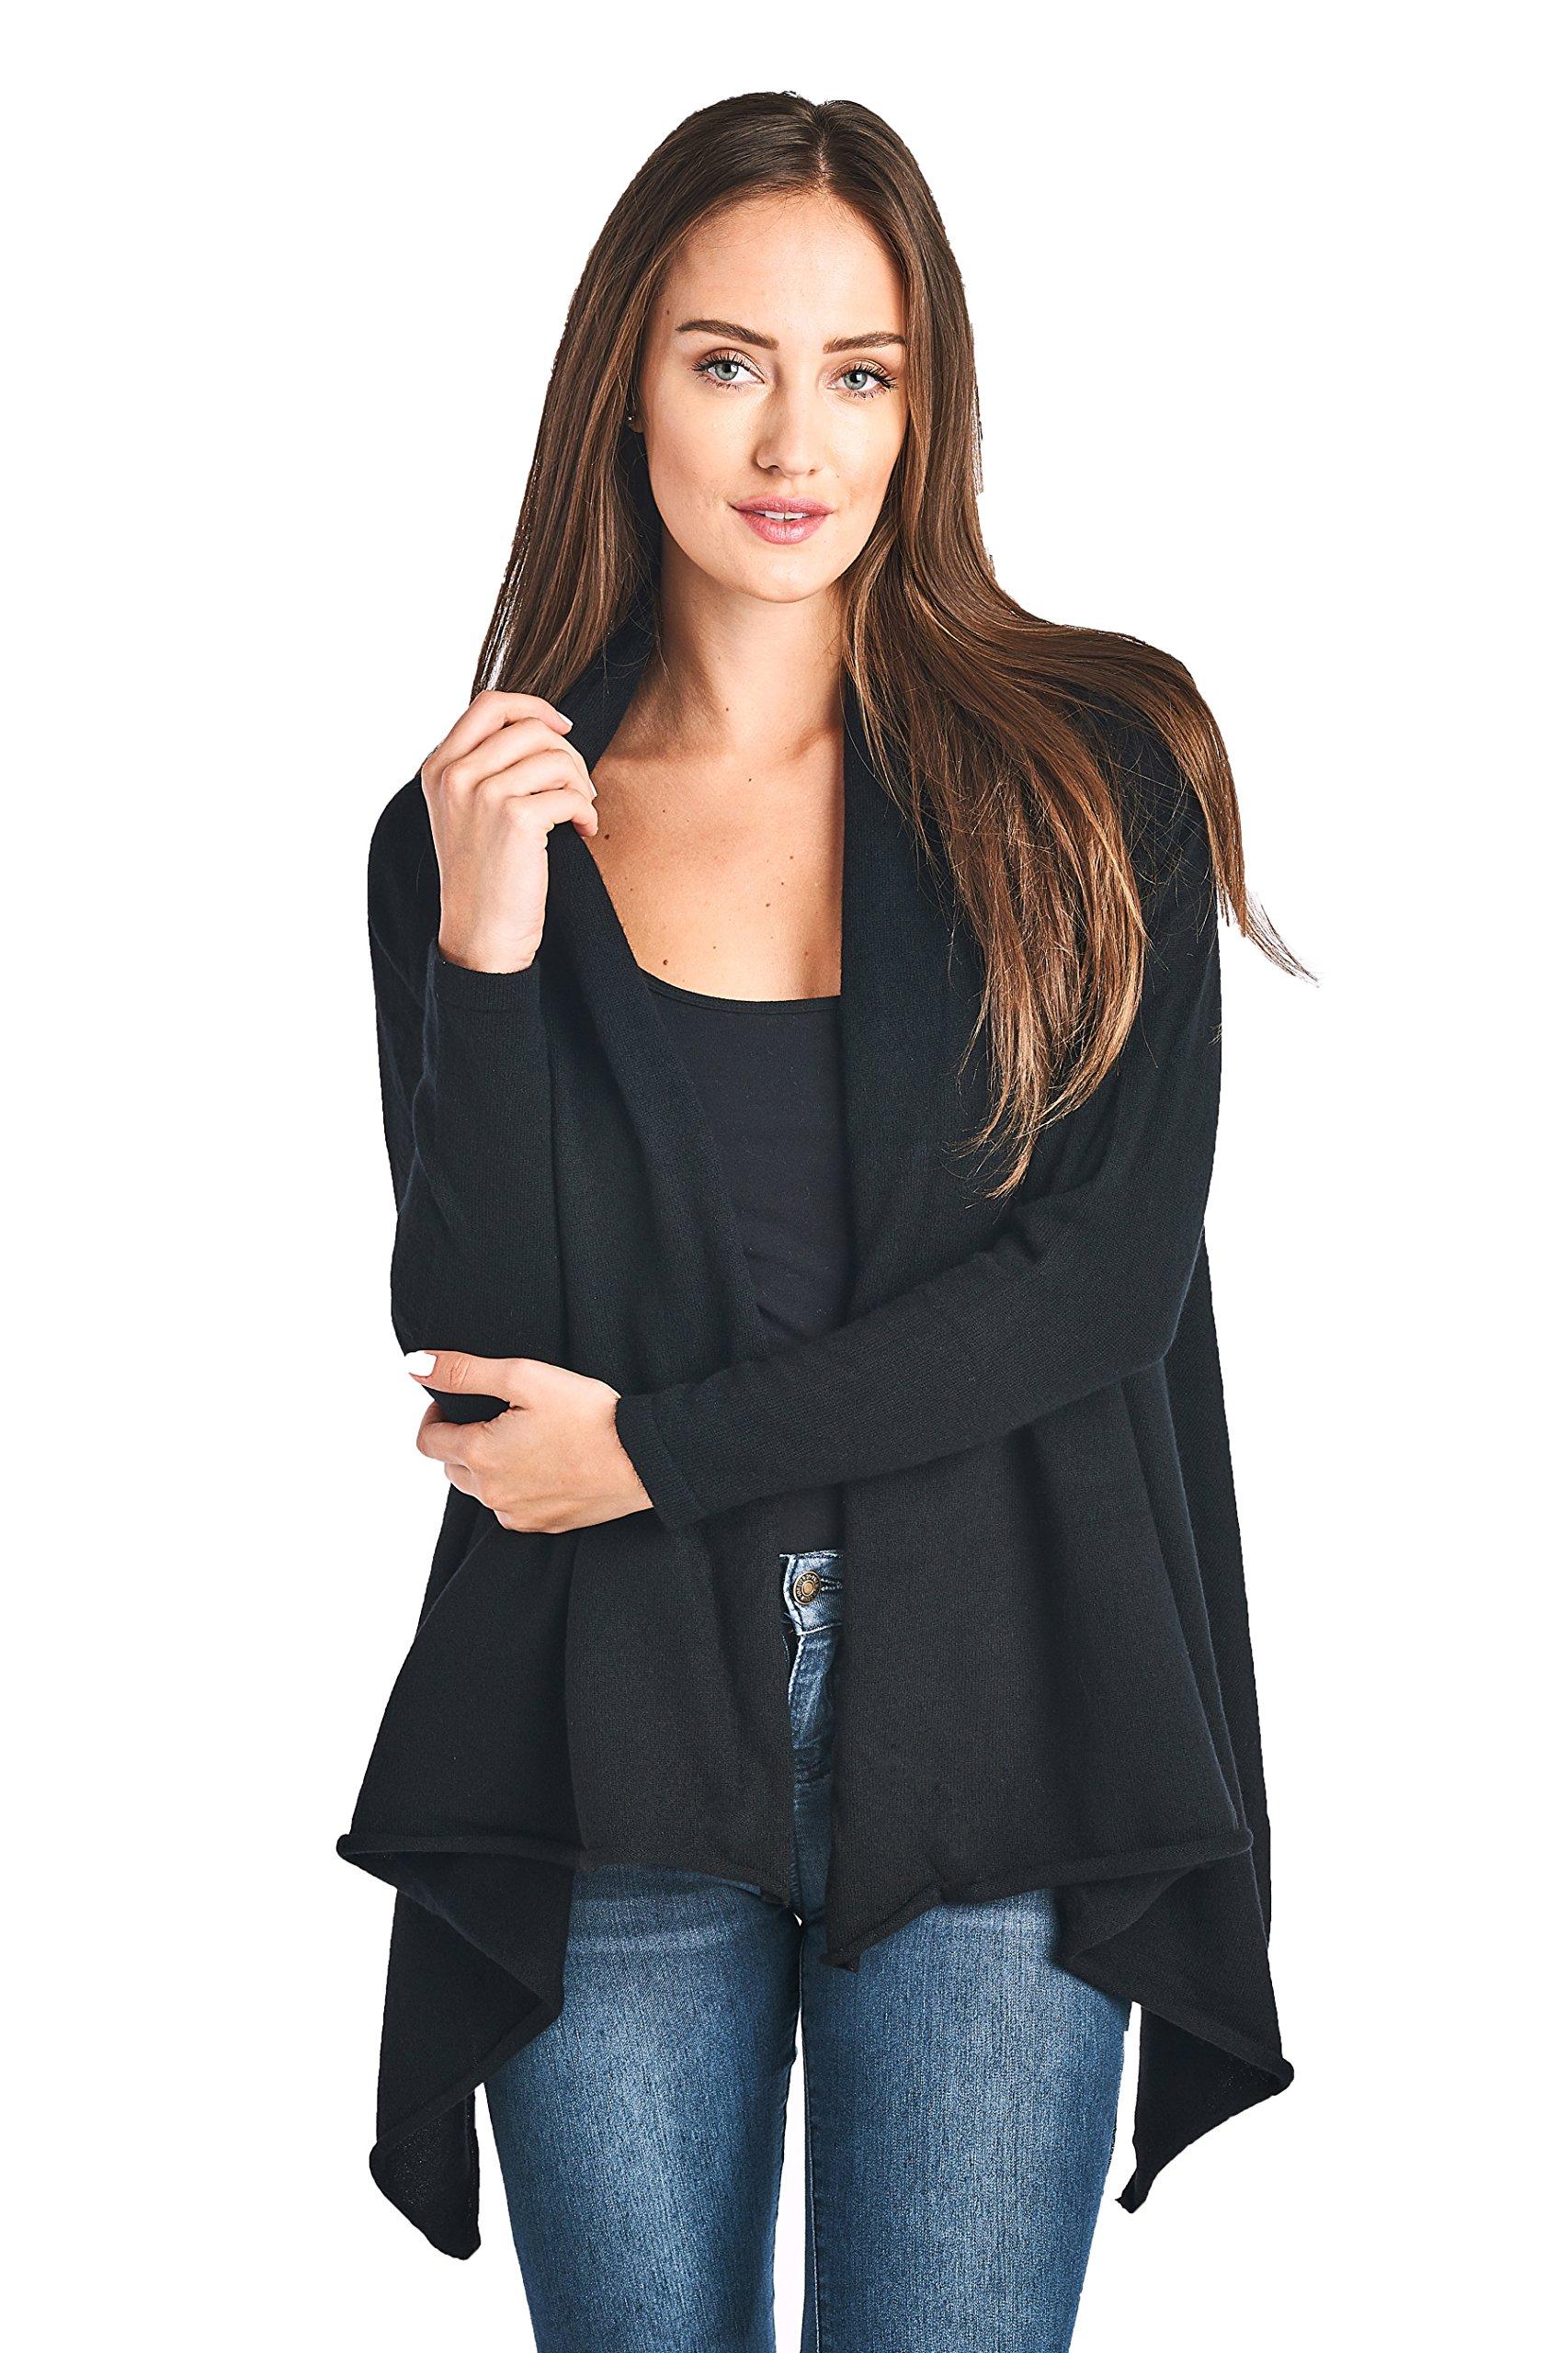 High Style Women's 100% Cashmere Long Sleeve Front Asymmetric Hem Open Cardigan Sweater (17616, Black, XL)